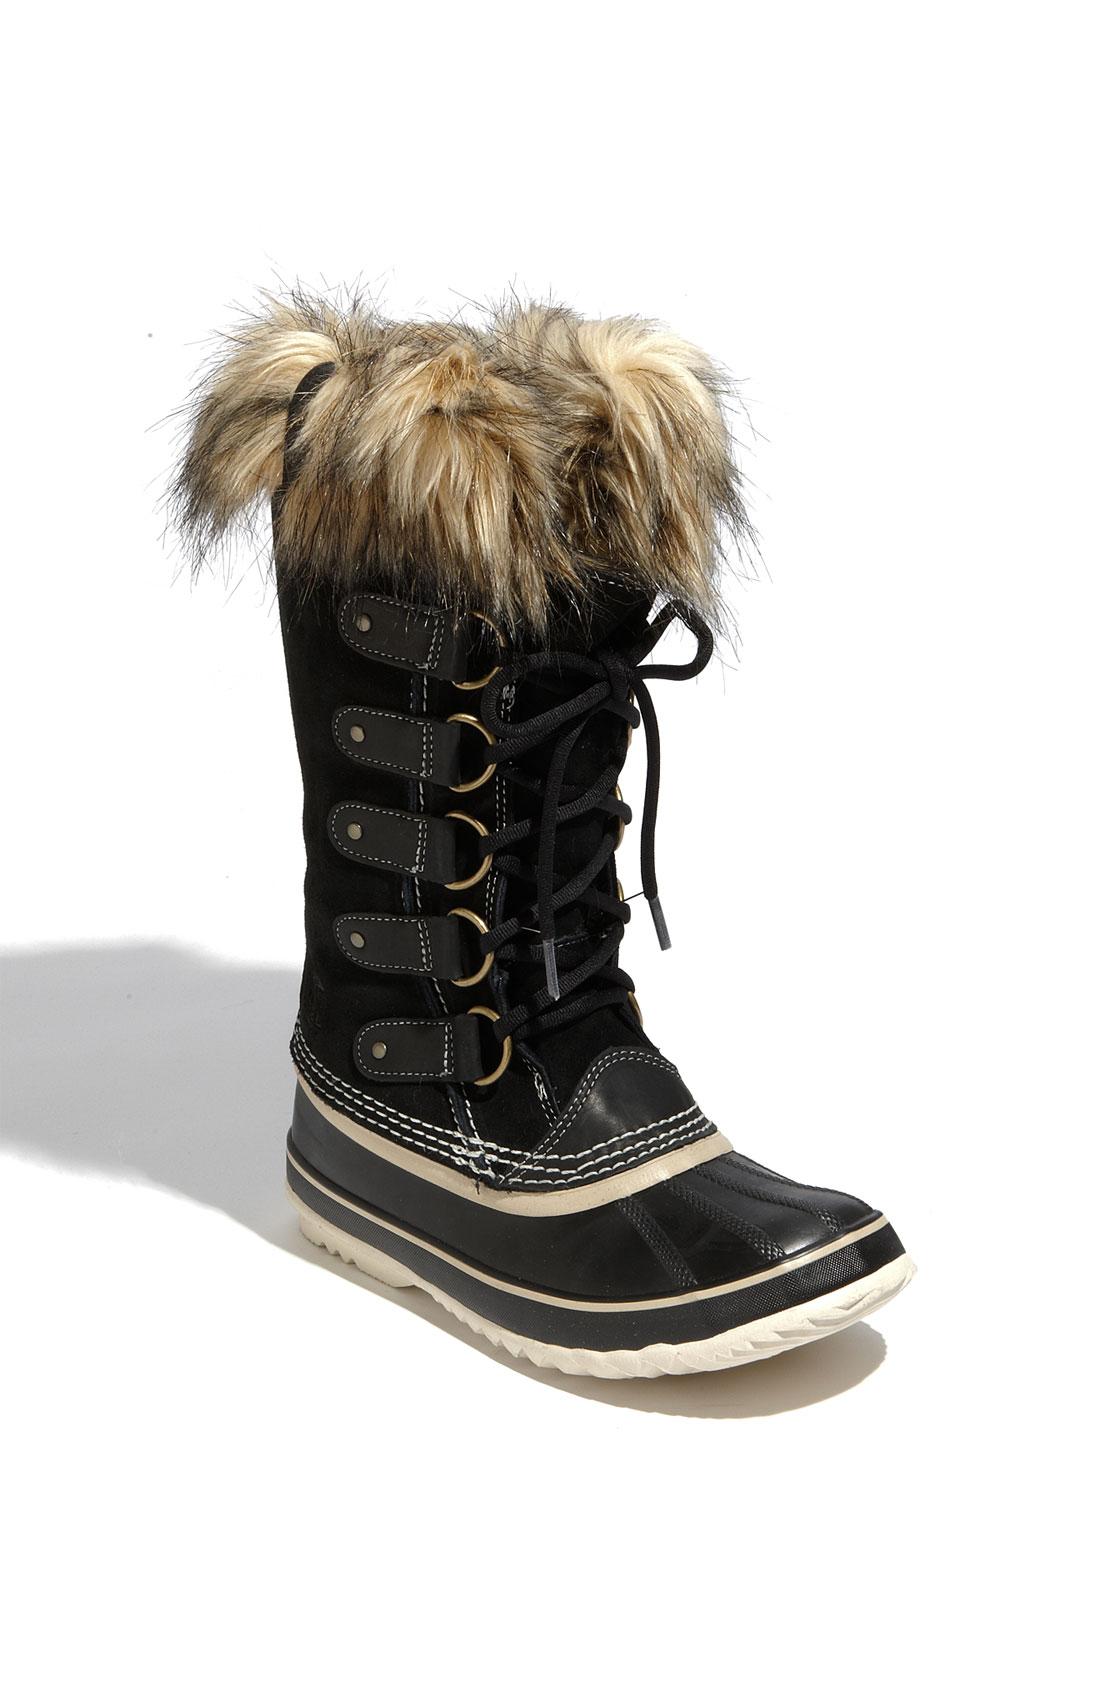 sorel joan of arctic faux fur waterproof boots in black. Black Bedroom Furniture Sets. Home Design Ideas